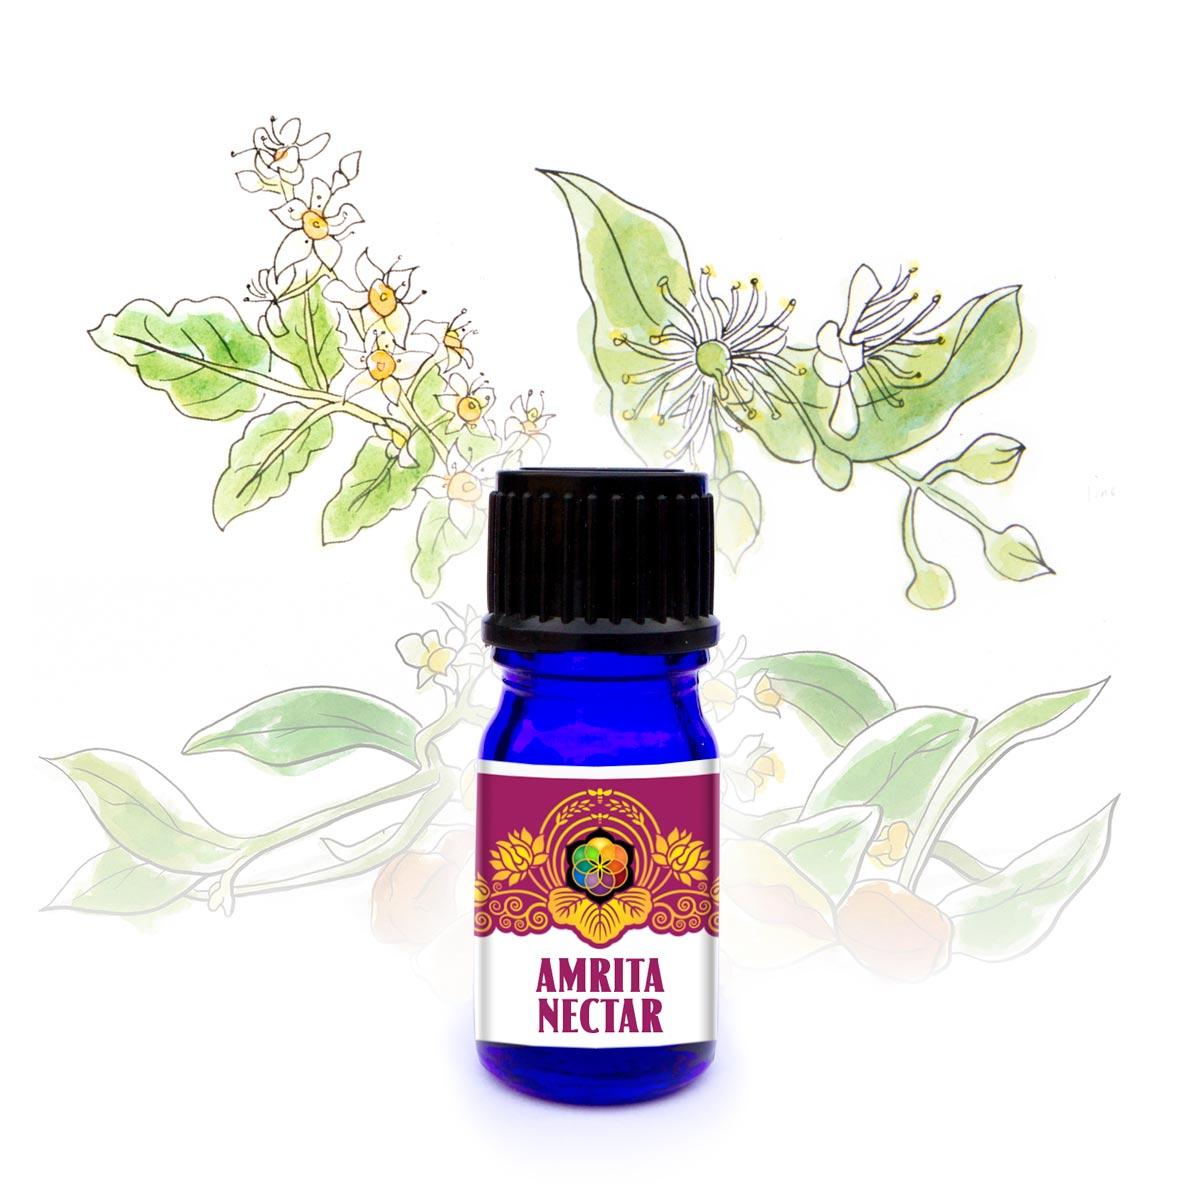 amrita-nectar